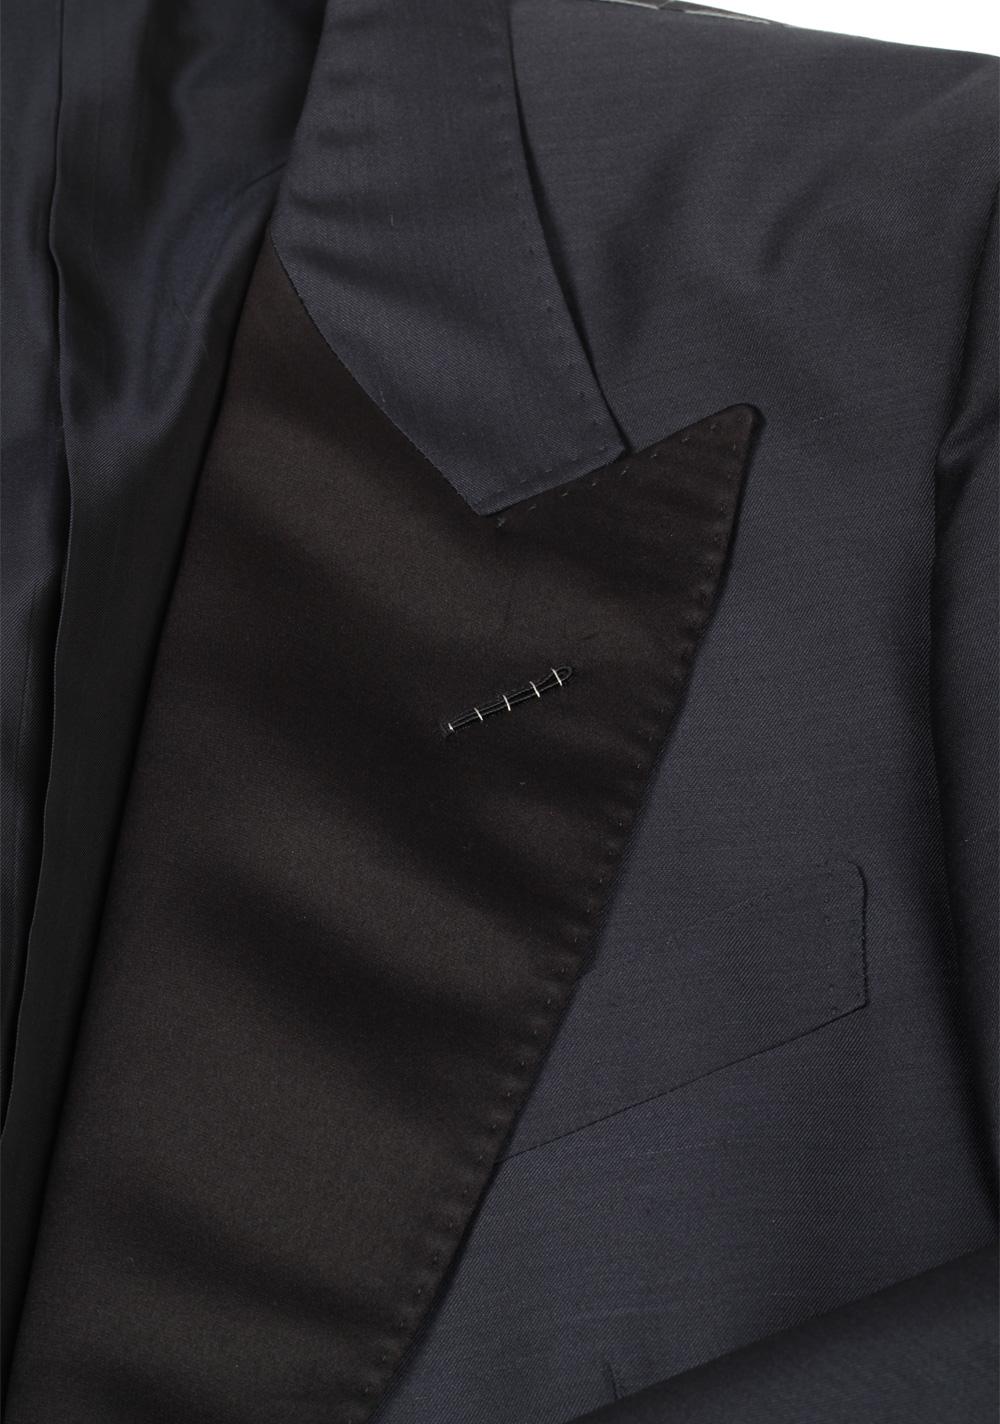 TOM FORD Shelton Midnight Blue Tuxedo Smoking Suit Size 52 / 42R U.S. | Costume Limité